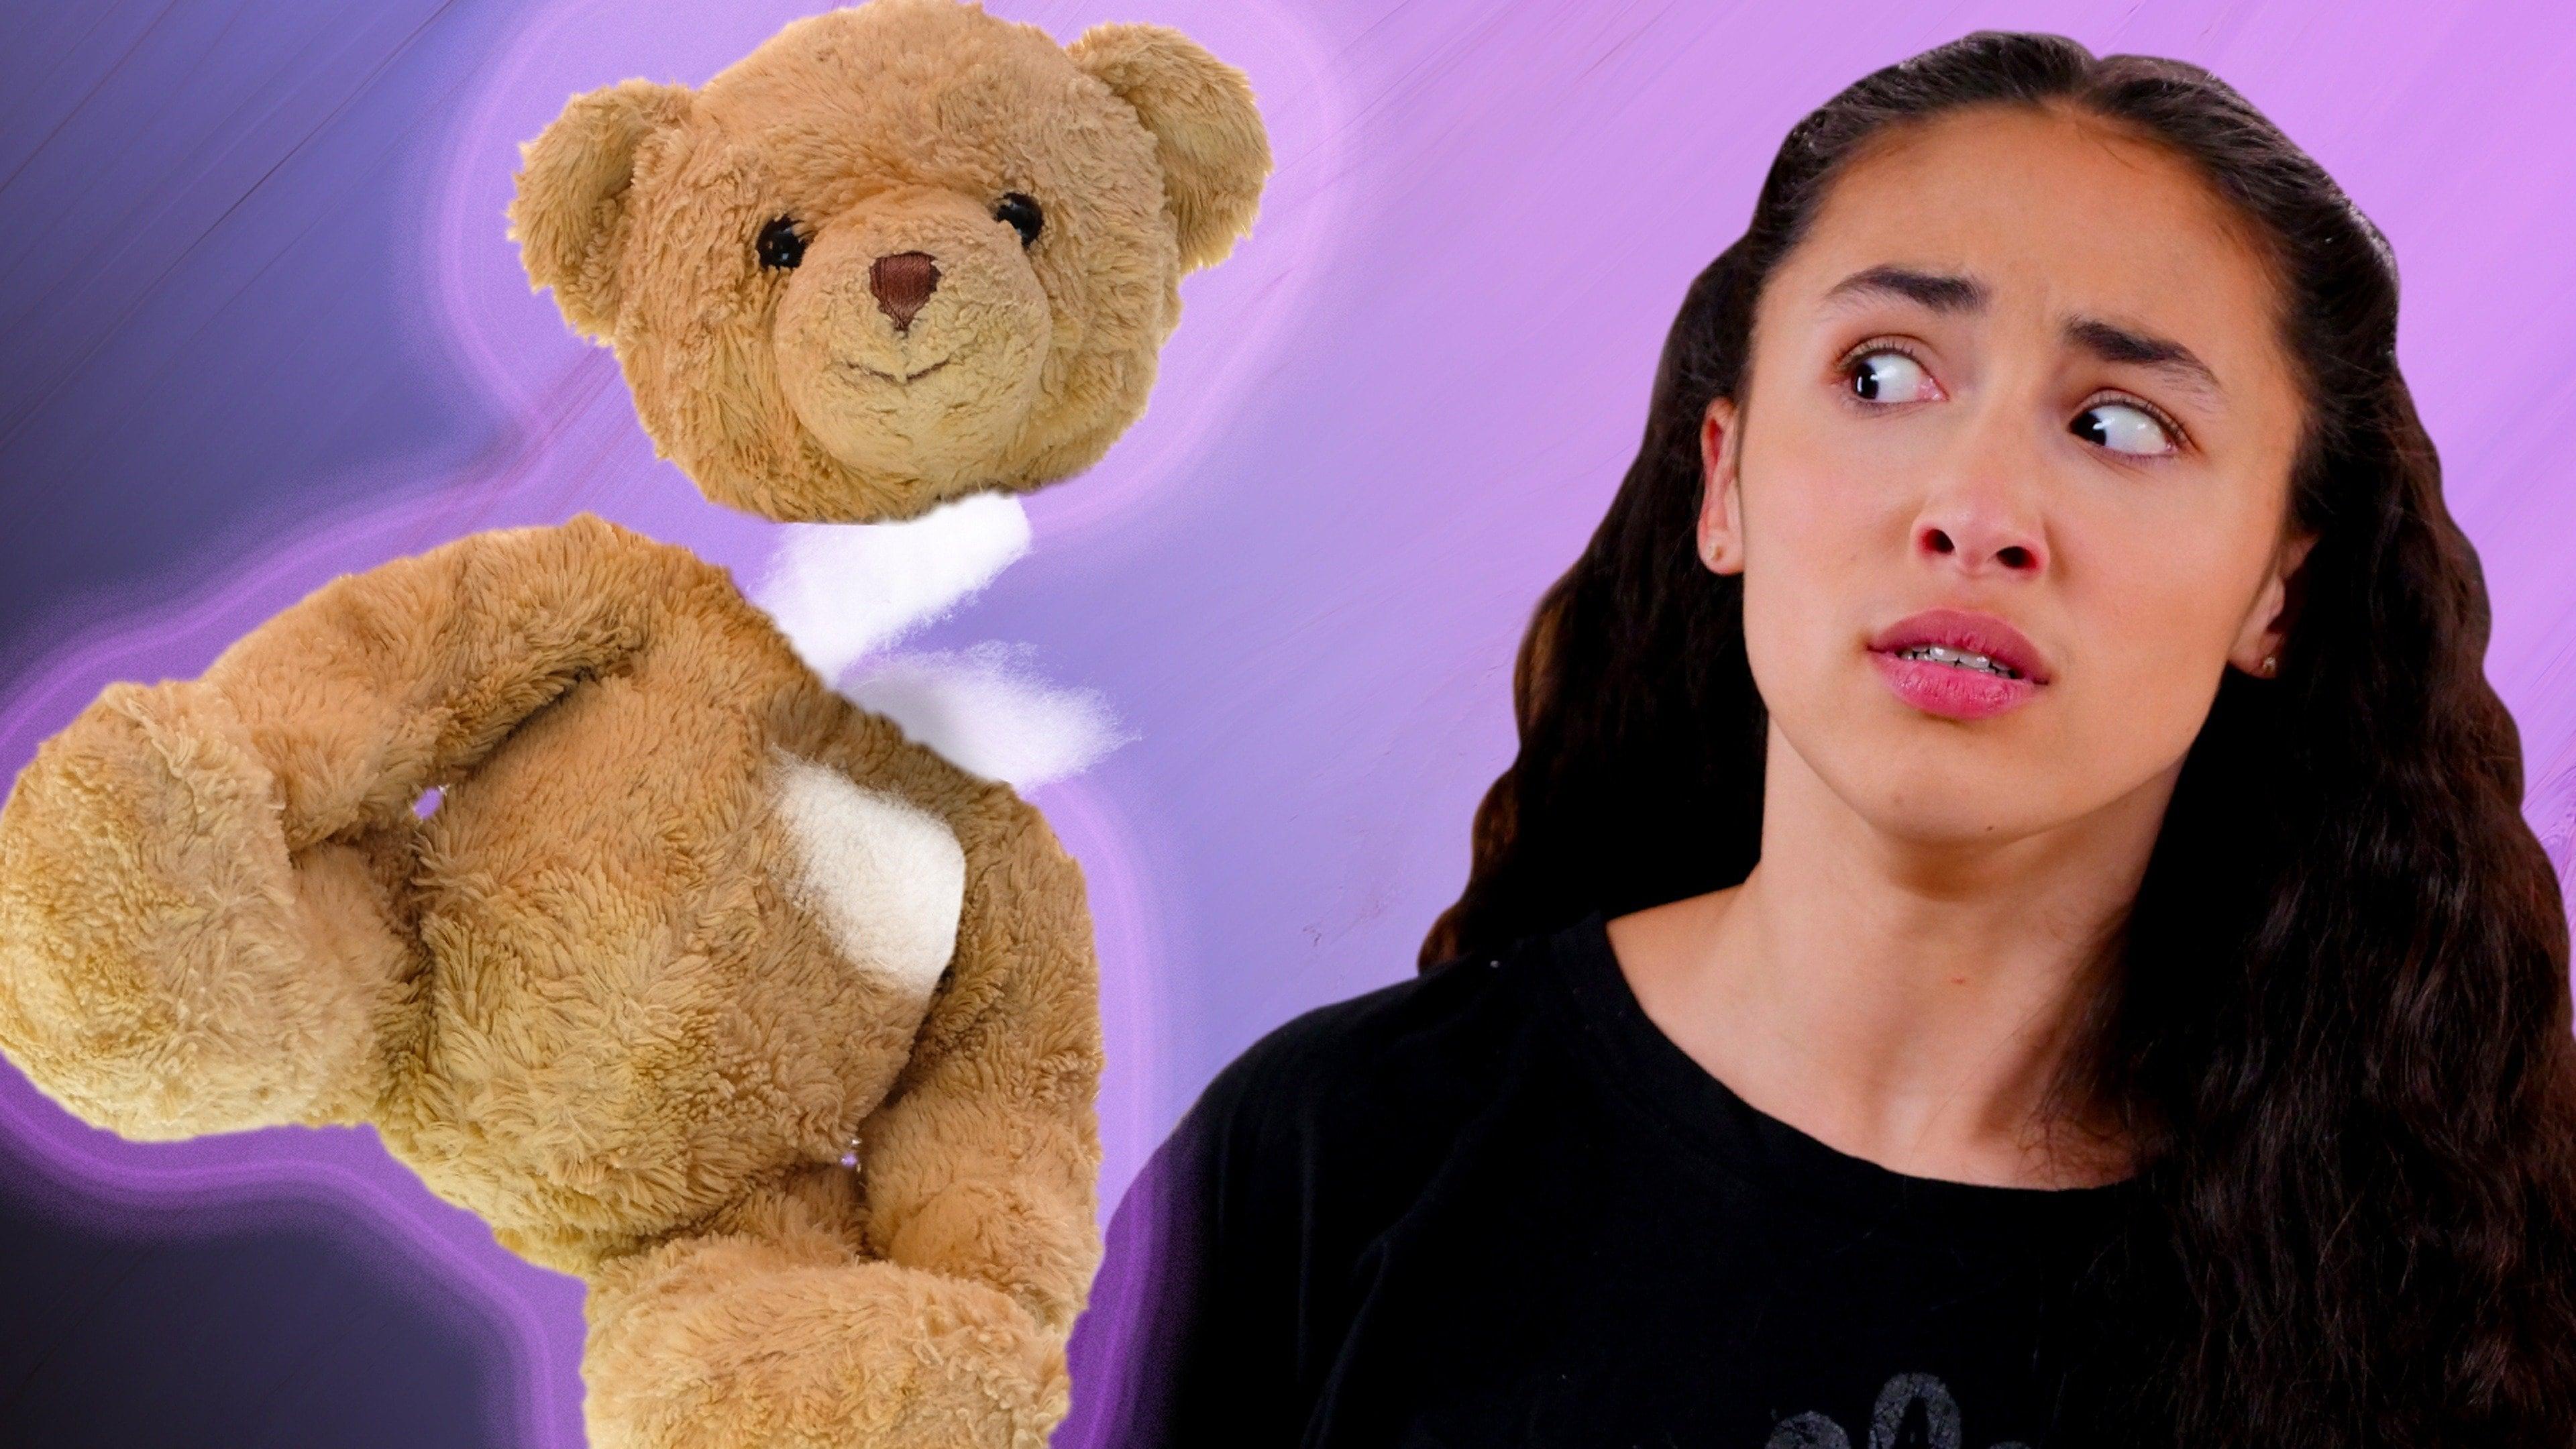 Teddy Bear Killer Trick